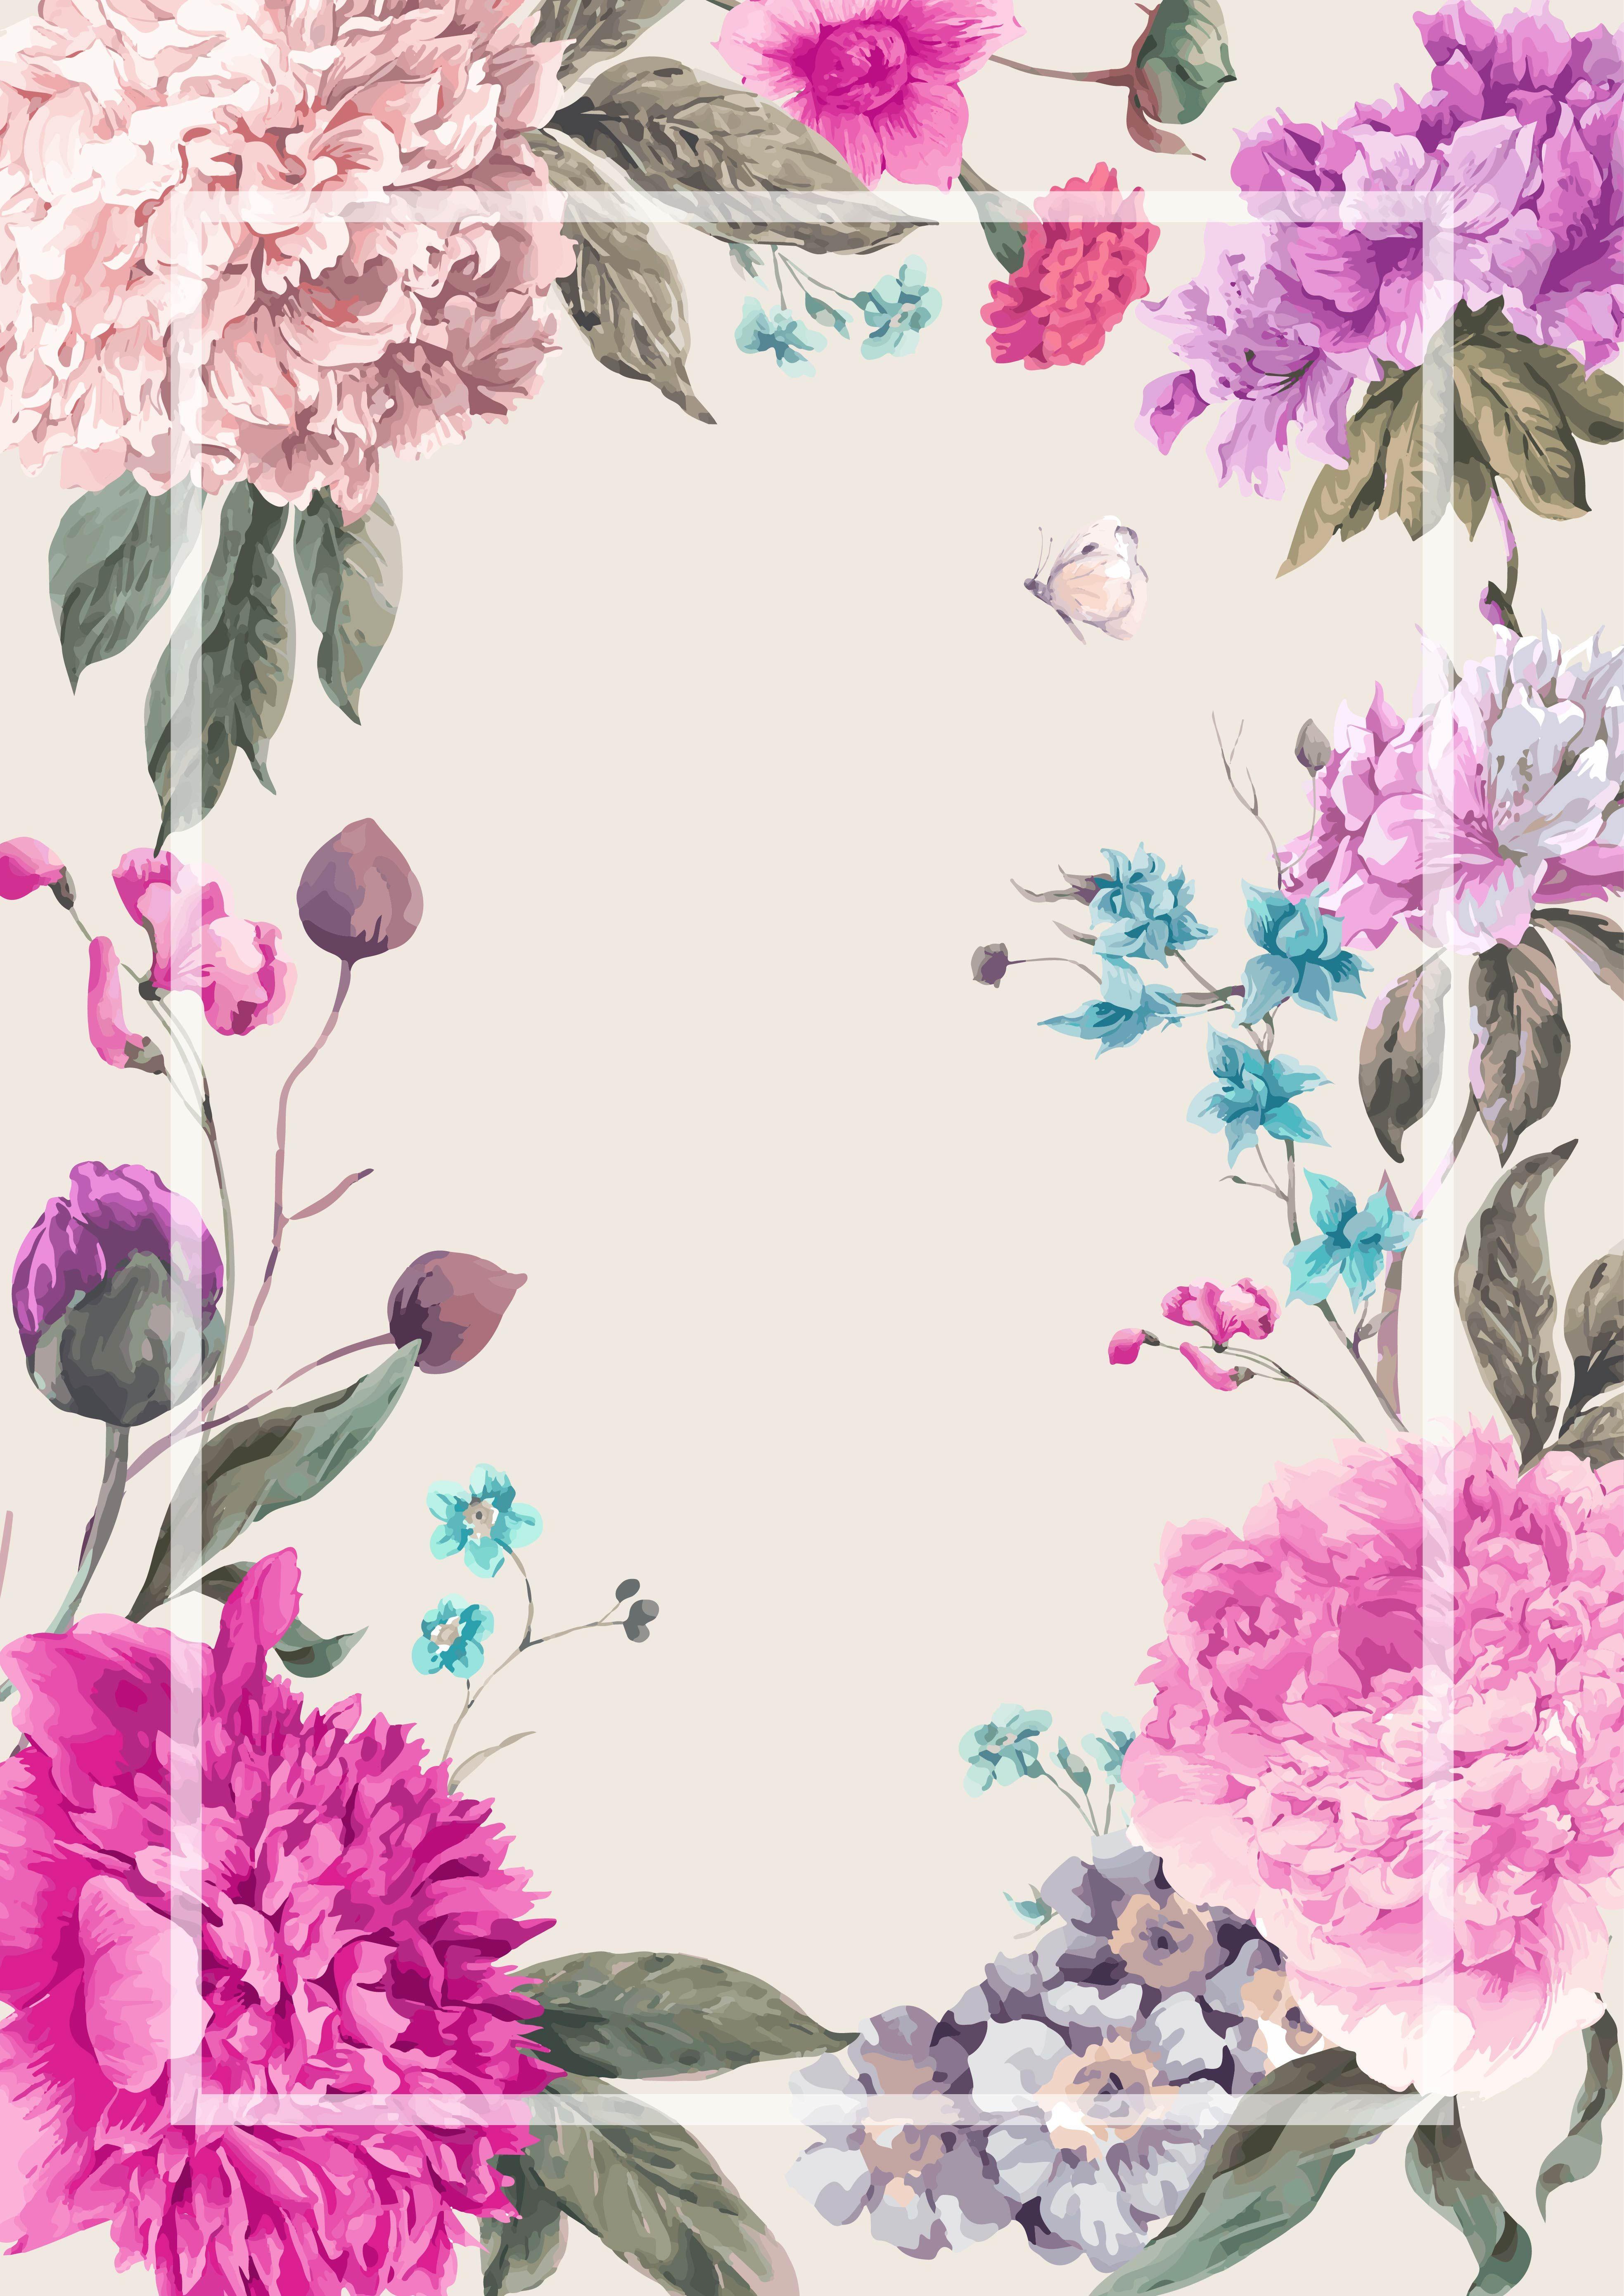 Creative Watercolor Flowers Watercolor Flowers Vector Art Card